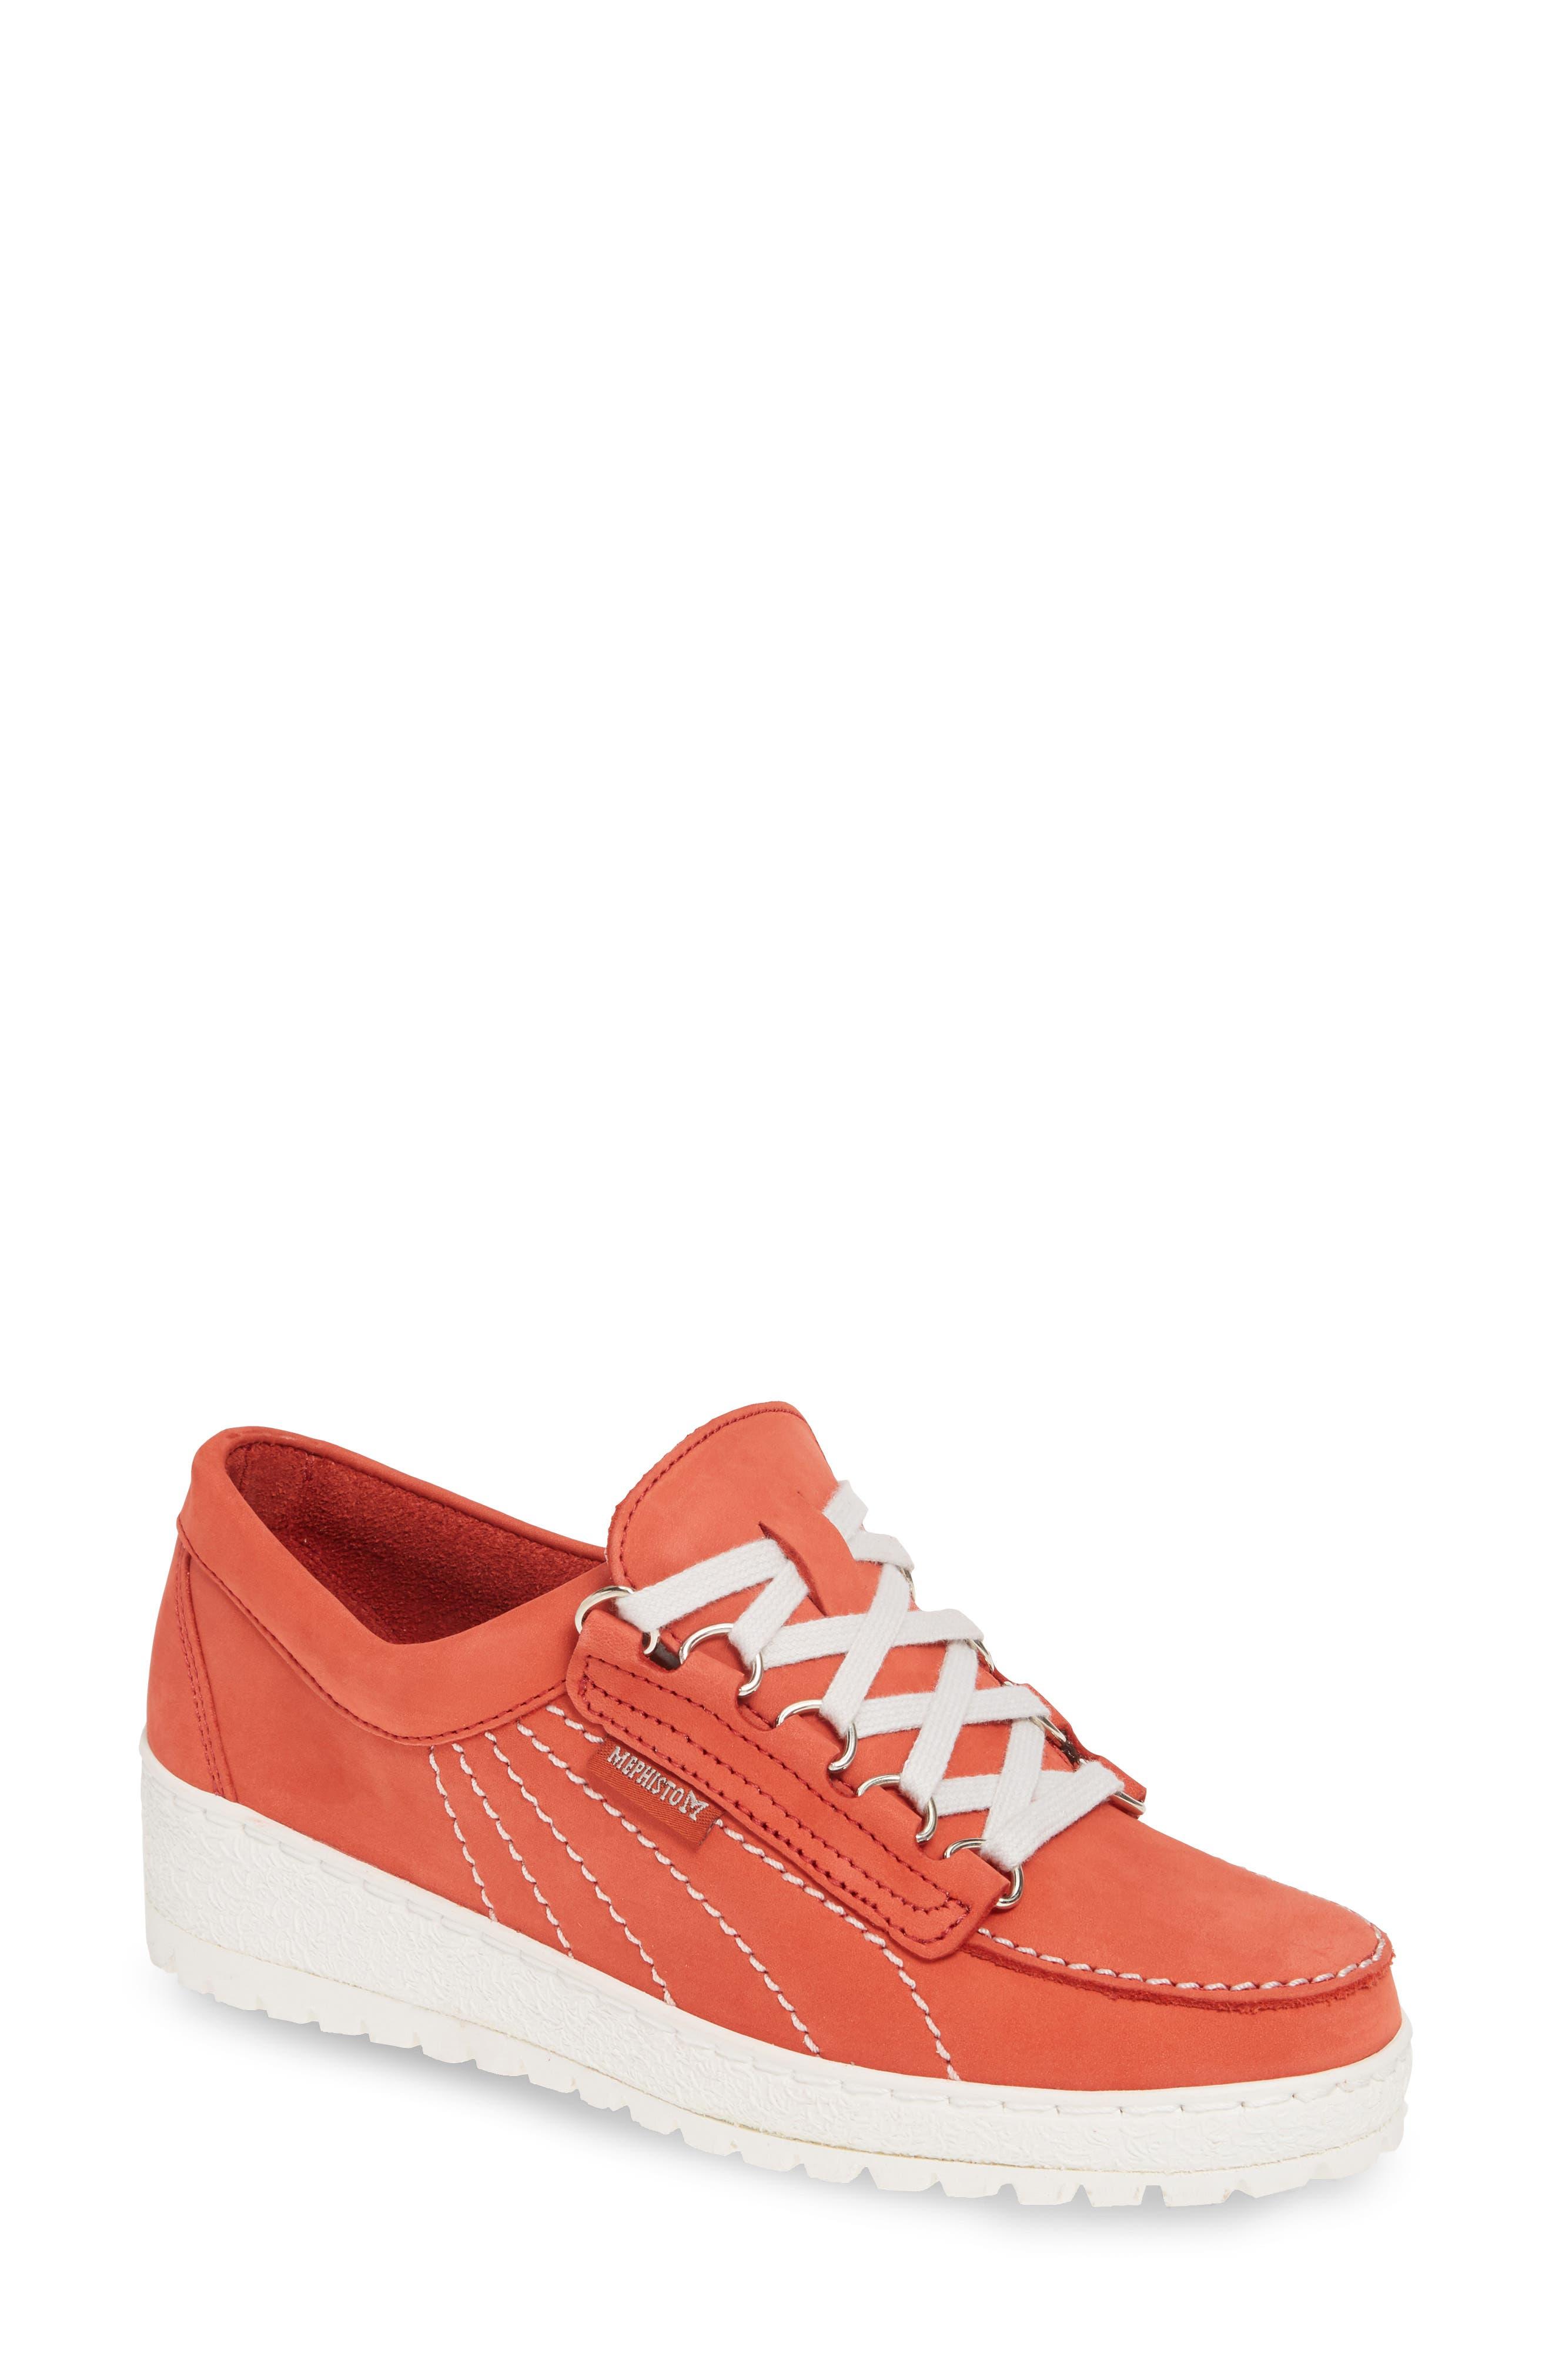 Mephisto Lady Low Top Sneaker, Orange